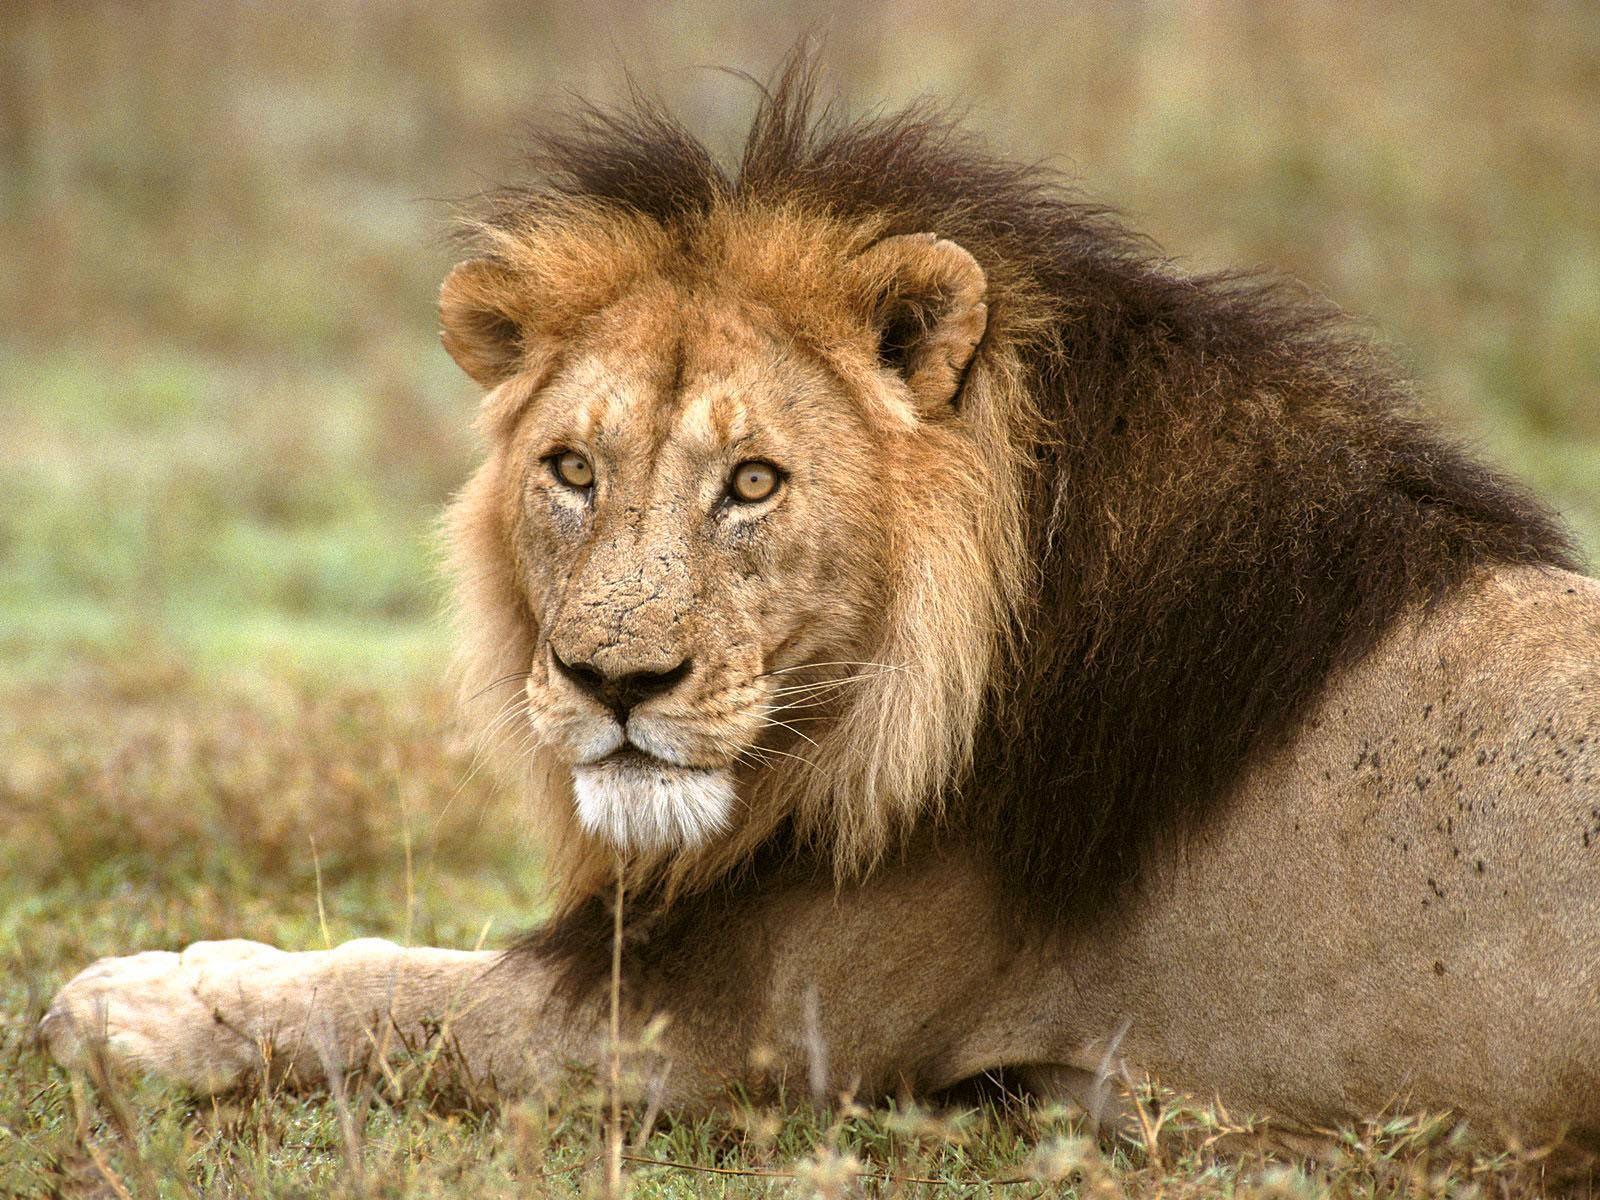 Wonderful   Wallpaper Horse Lion - The-best-top-desktop-lion-wallpapers-hd-lion-wallpaper-5  Photograph_429177.jpg